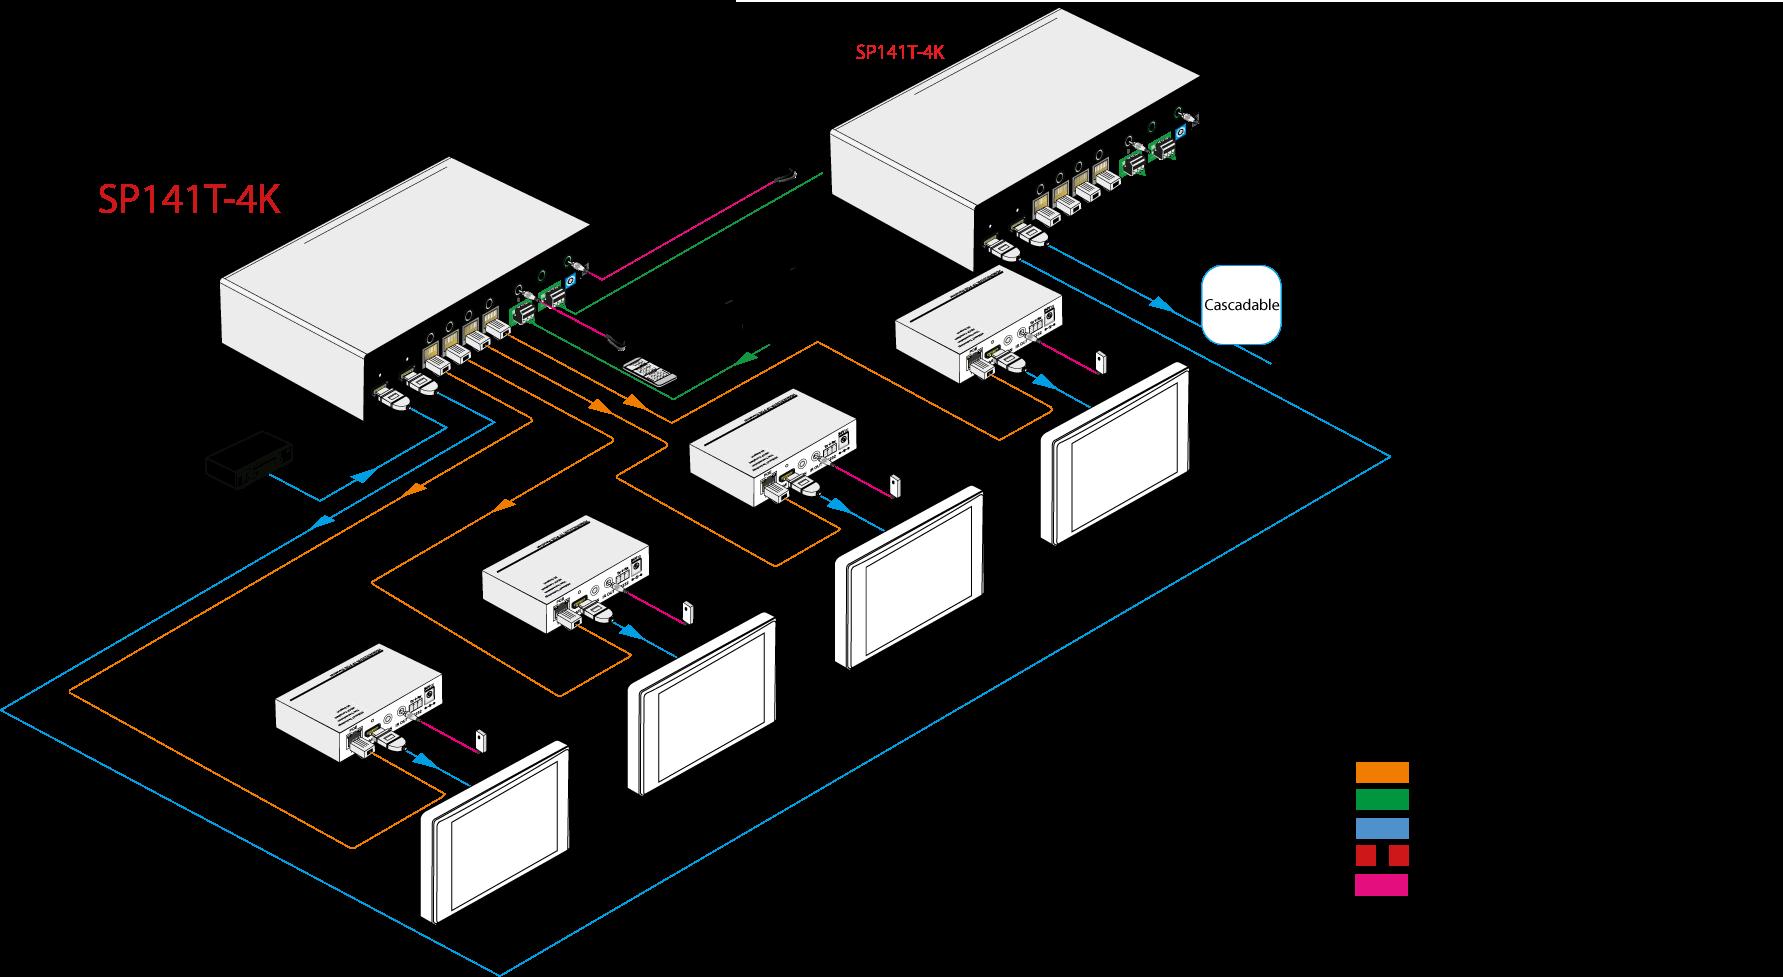 SP2H2-4K | Distributeur HDMI 1x2 extra plat, 4K@4:4:4